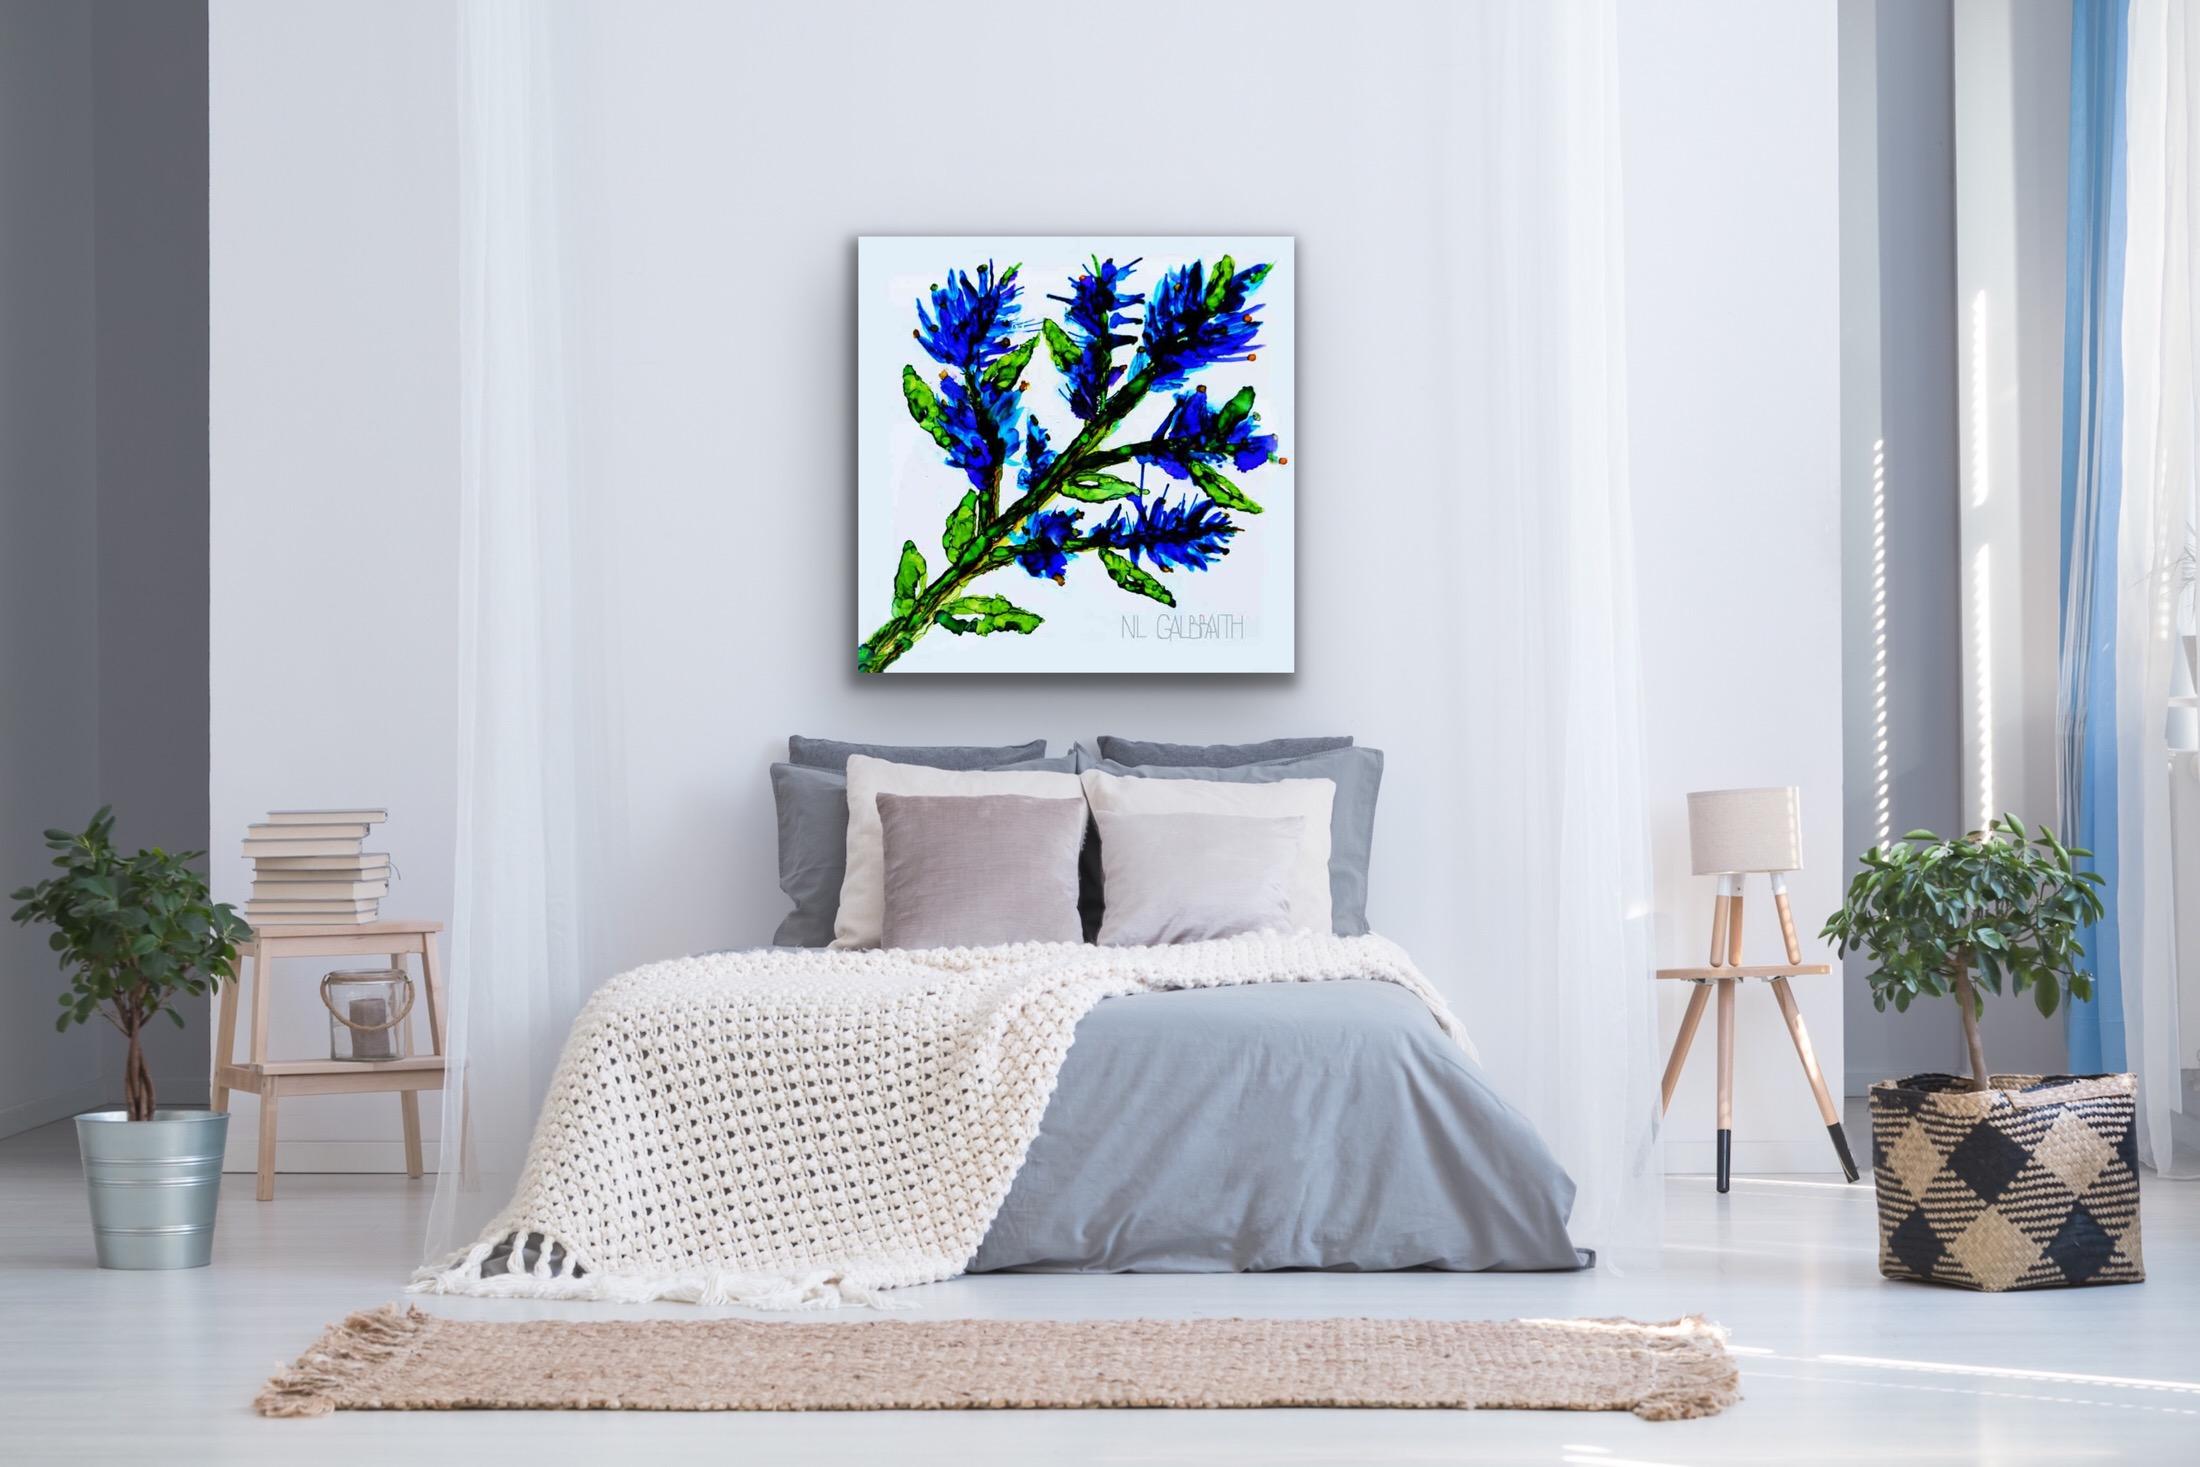 Large Blue Sprig Flower Graphic Over a Blue Bed